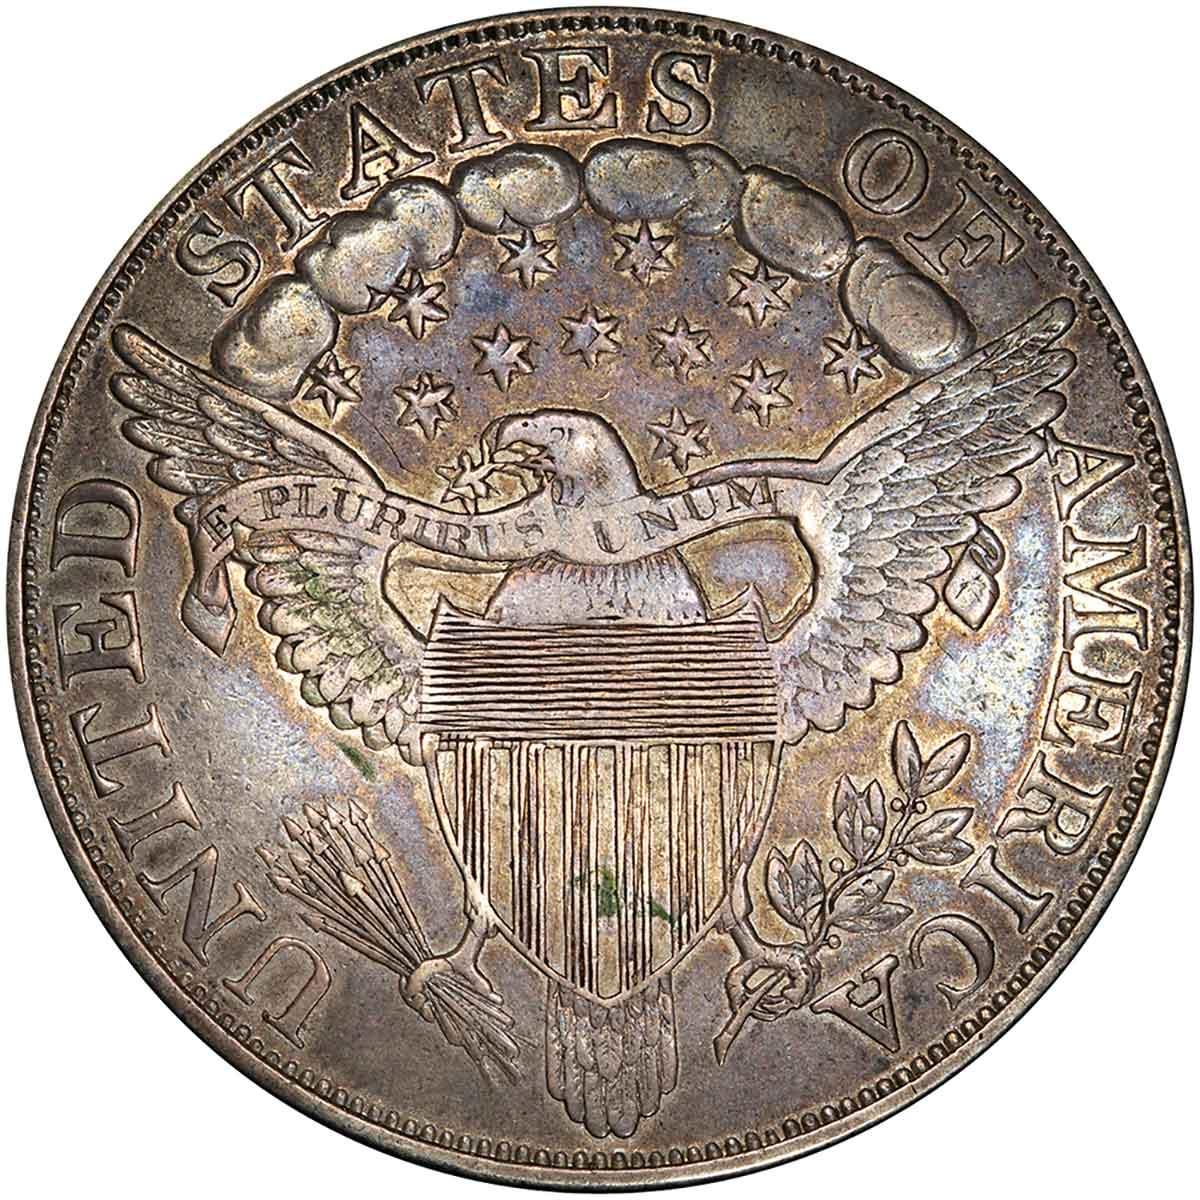 1804 Draped Bust Silver Dollar. Class III Restrike. BB-306. Second Reverse. Proof-55 (PCGS). reverse